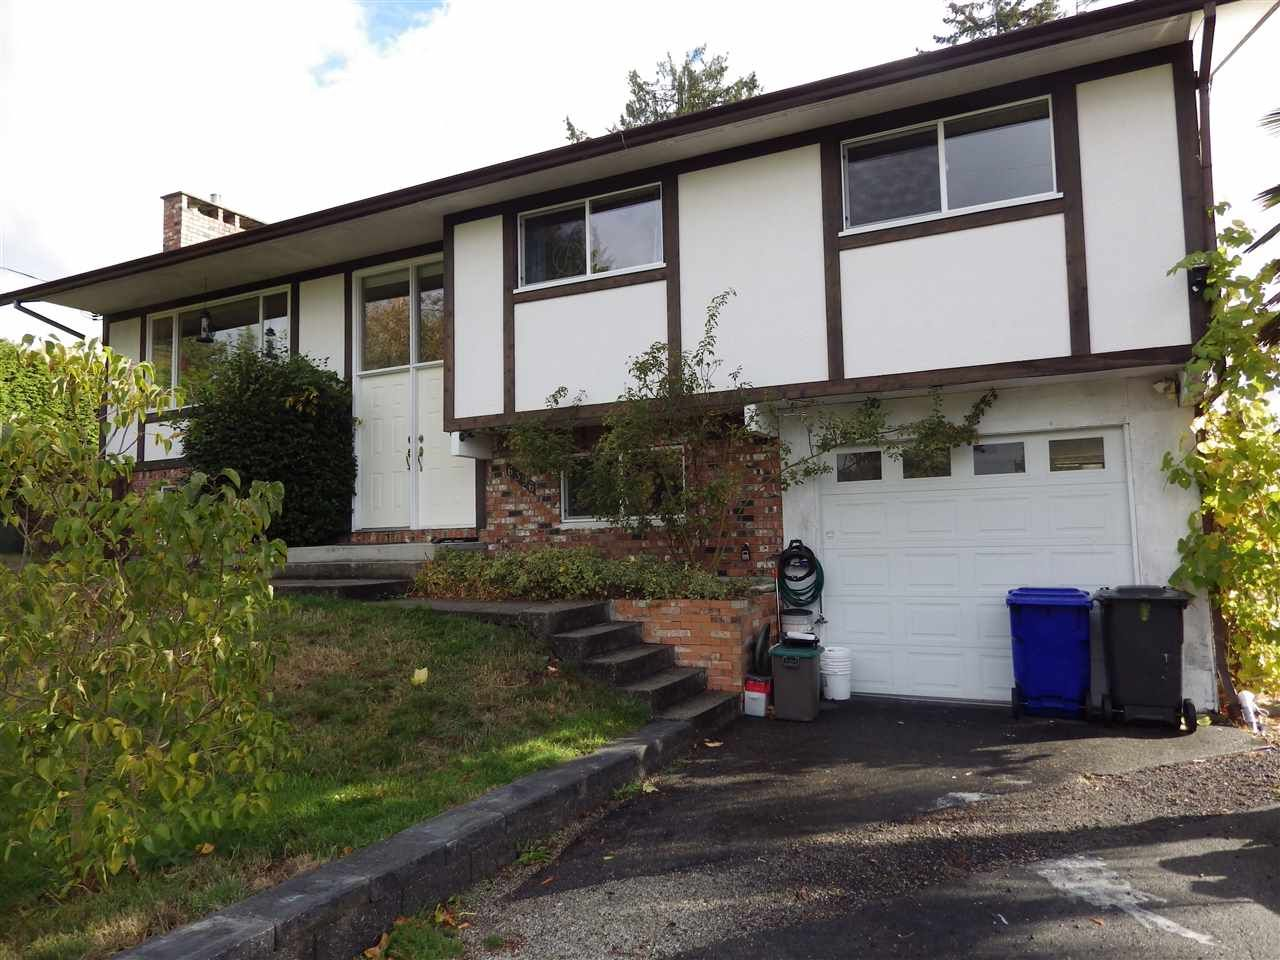 Main Photo: 6396 NORVAN Road in Sechelt: Sechelt District House for sale (Sunshine Coast)  : MLS®# R2214273